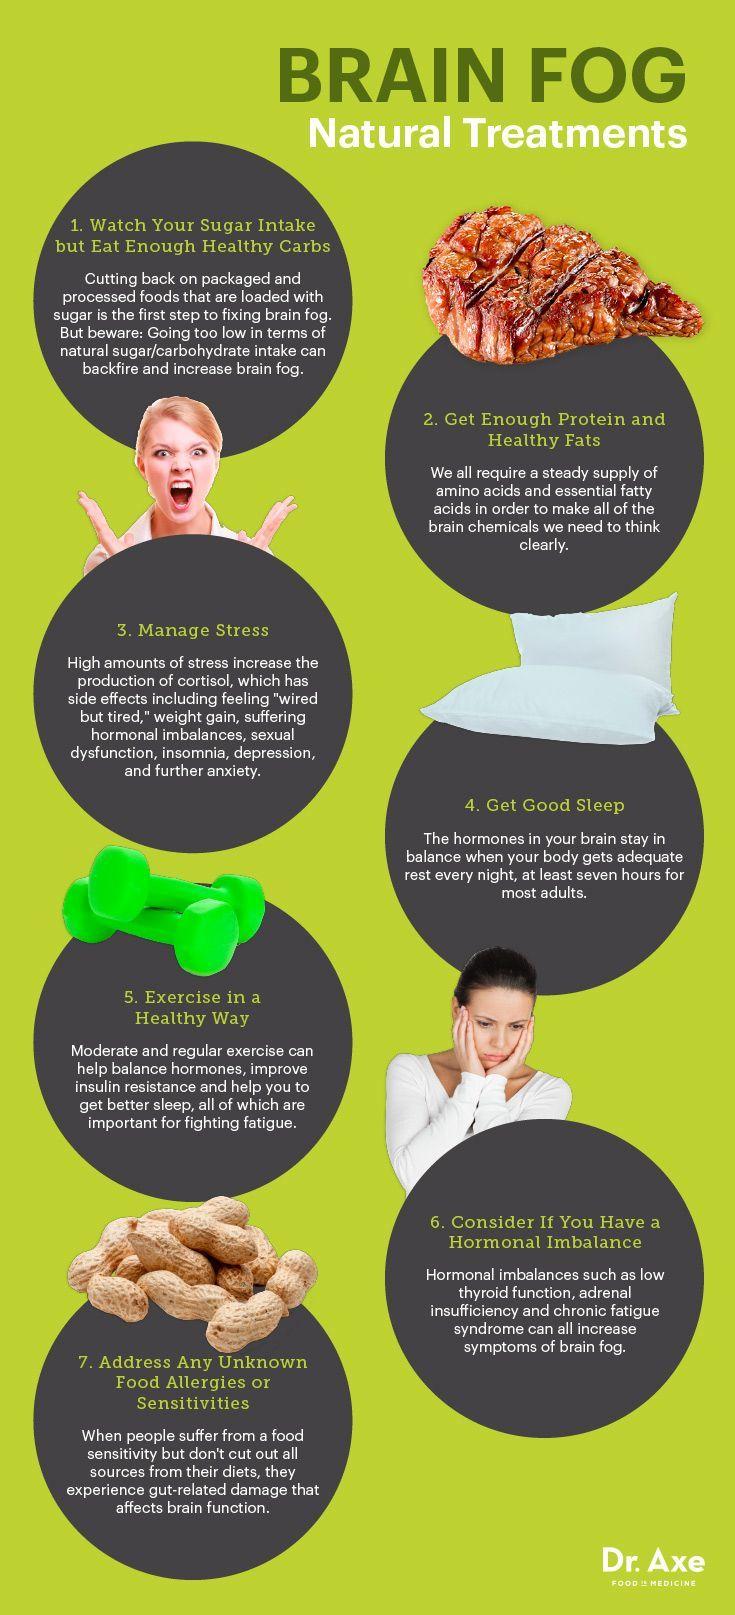 Brain Fog Causes, Symptoms + 7 Natural Treatments | Health, Wellness